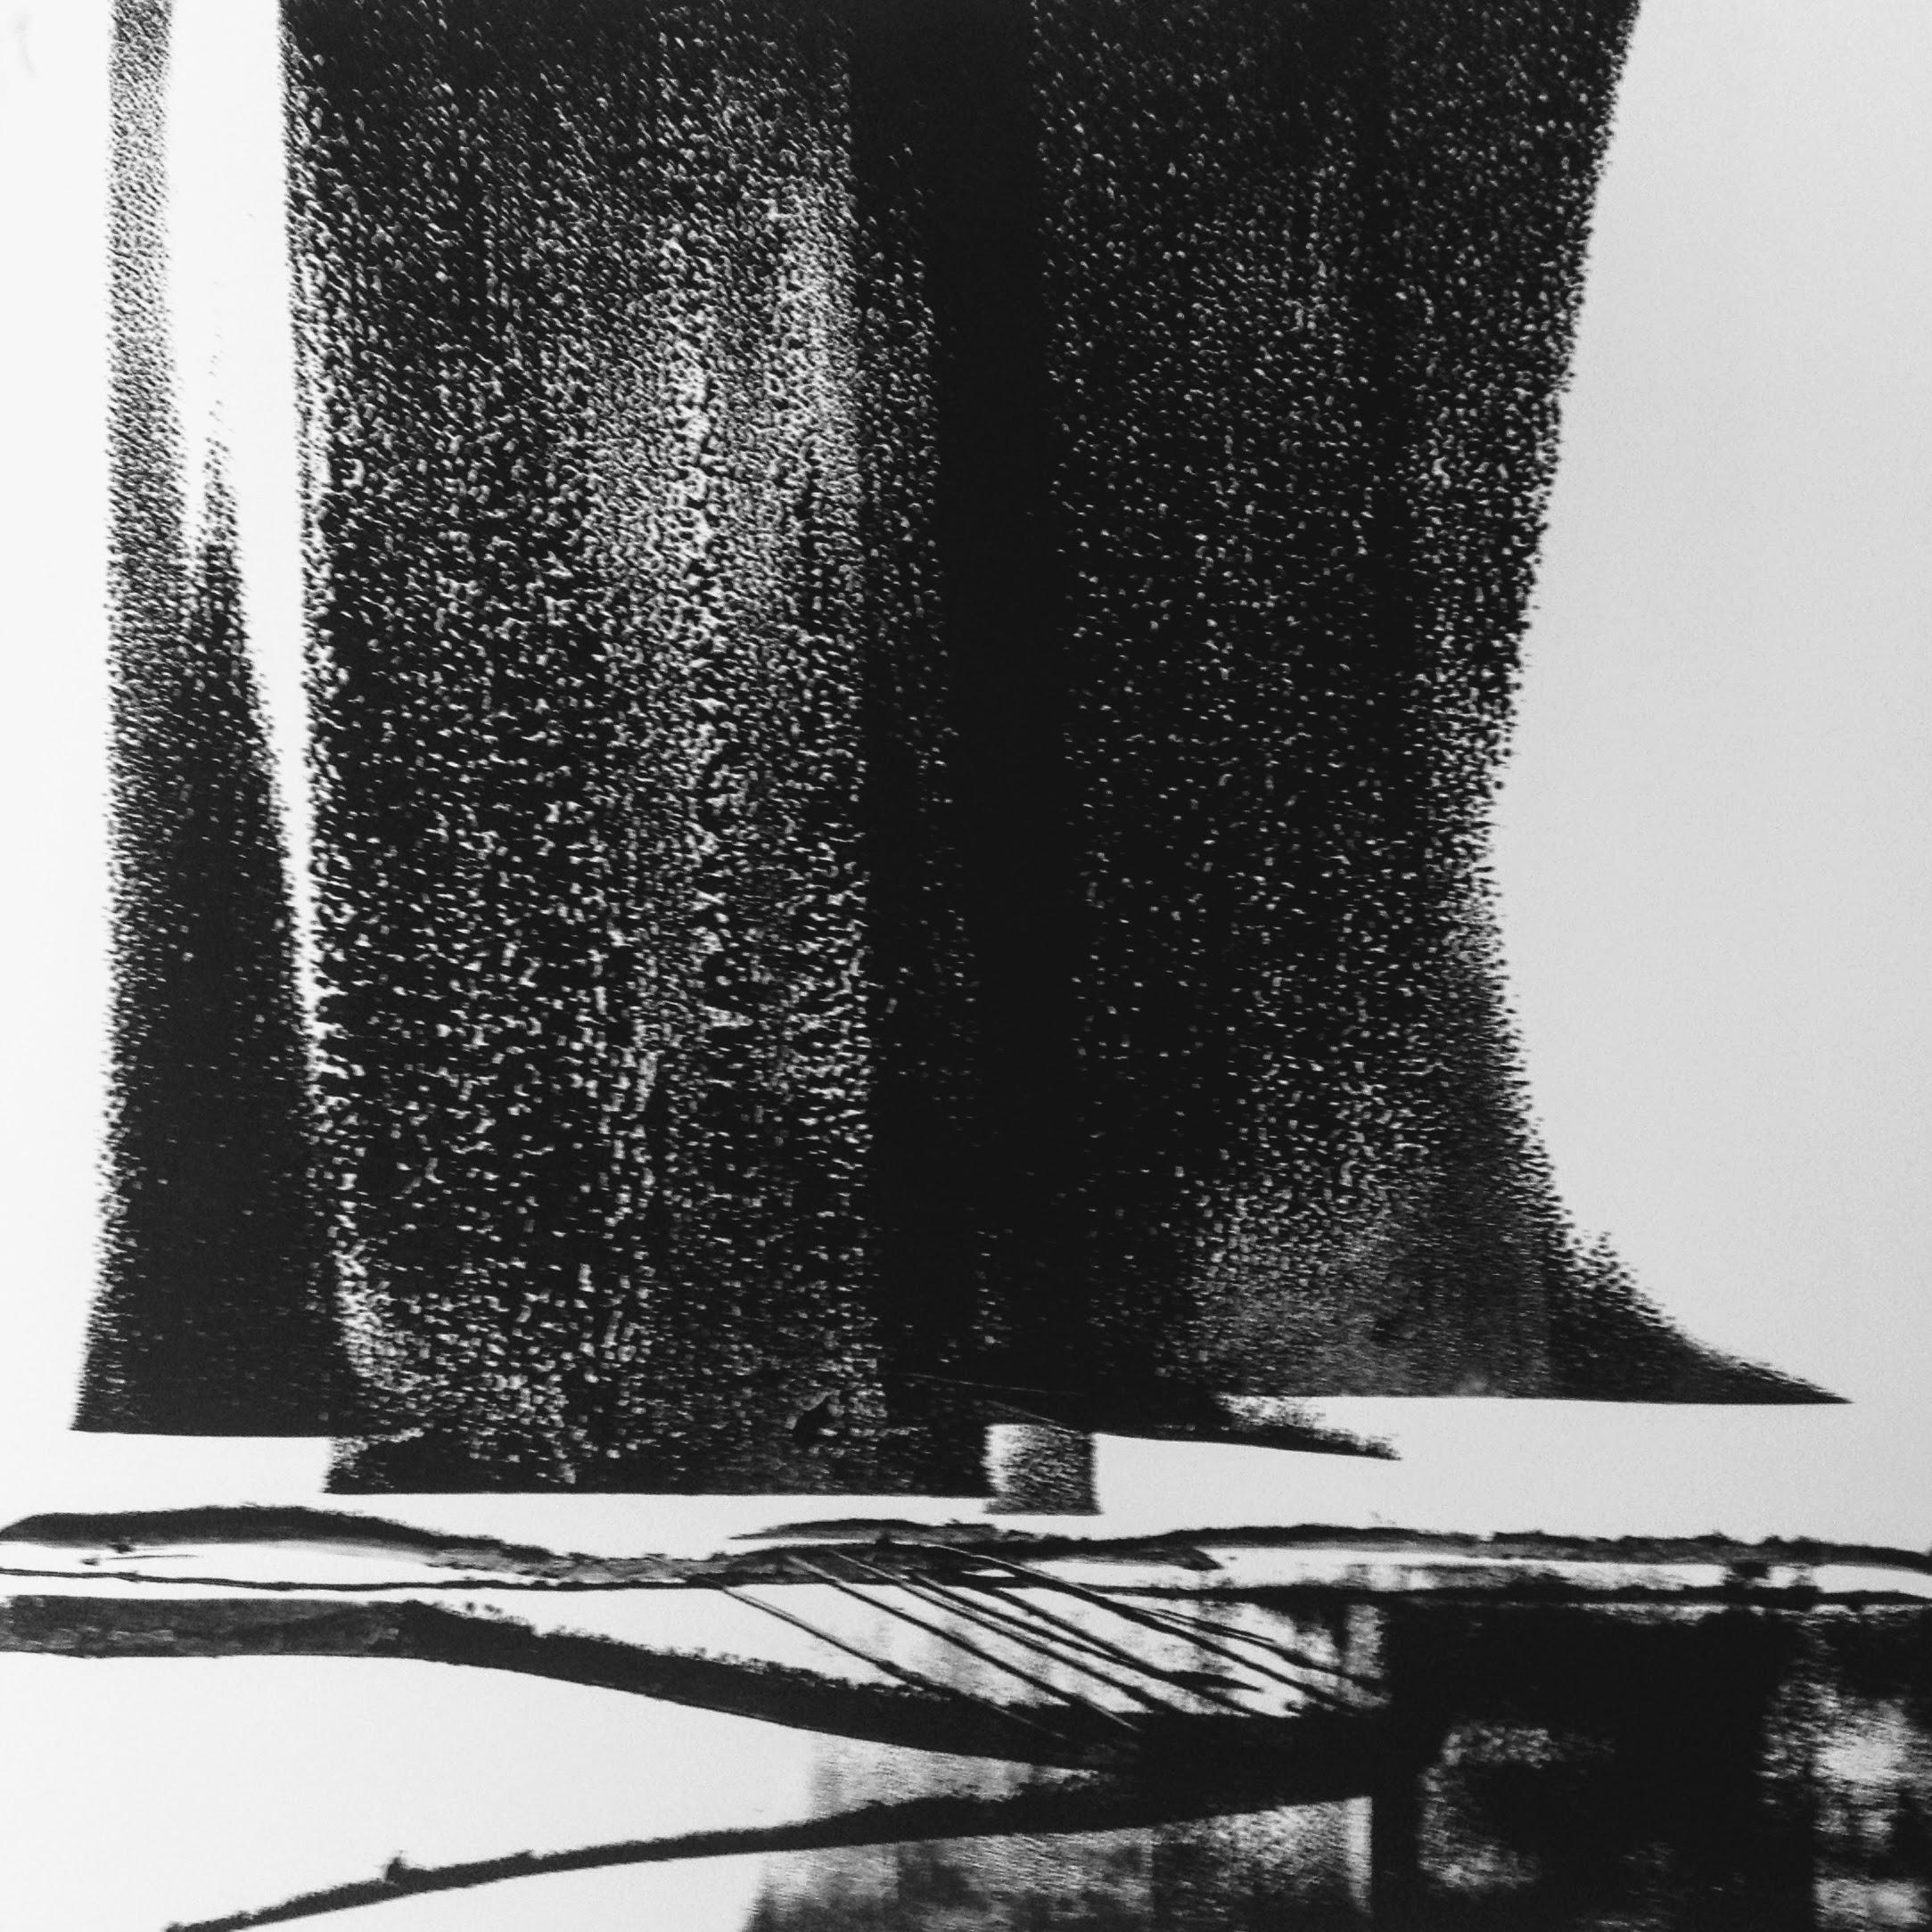 Dark Skies VII, monotype, 2017, 300x300mm, 250gm Somerset Satin